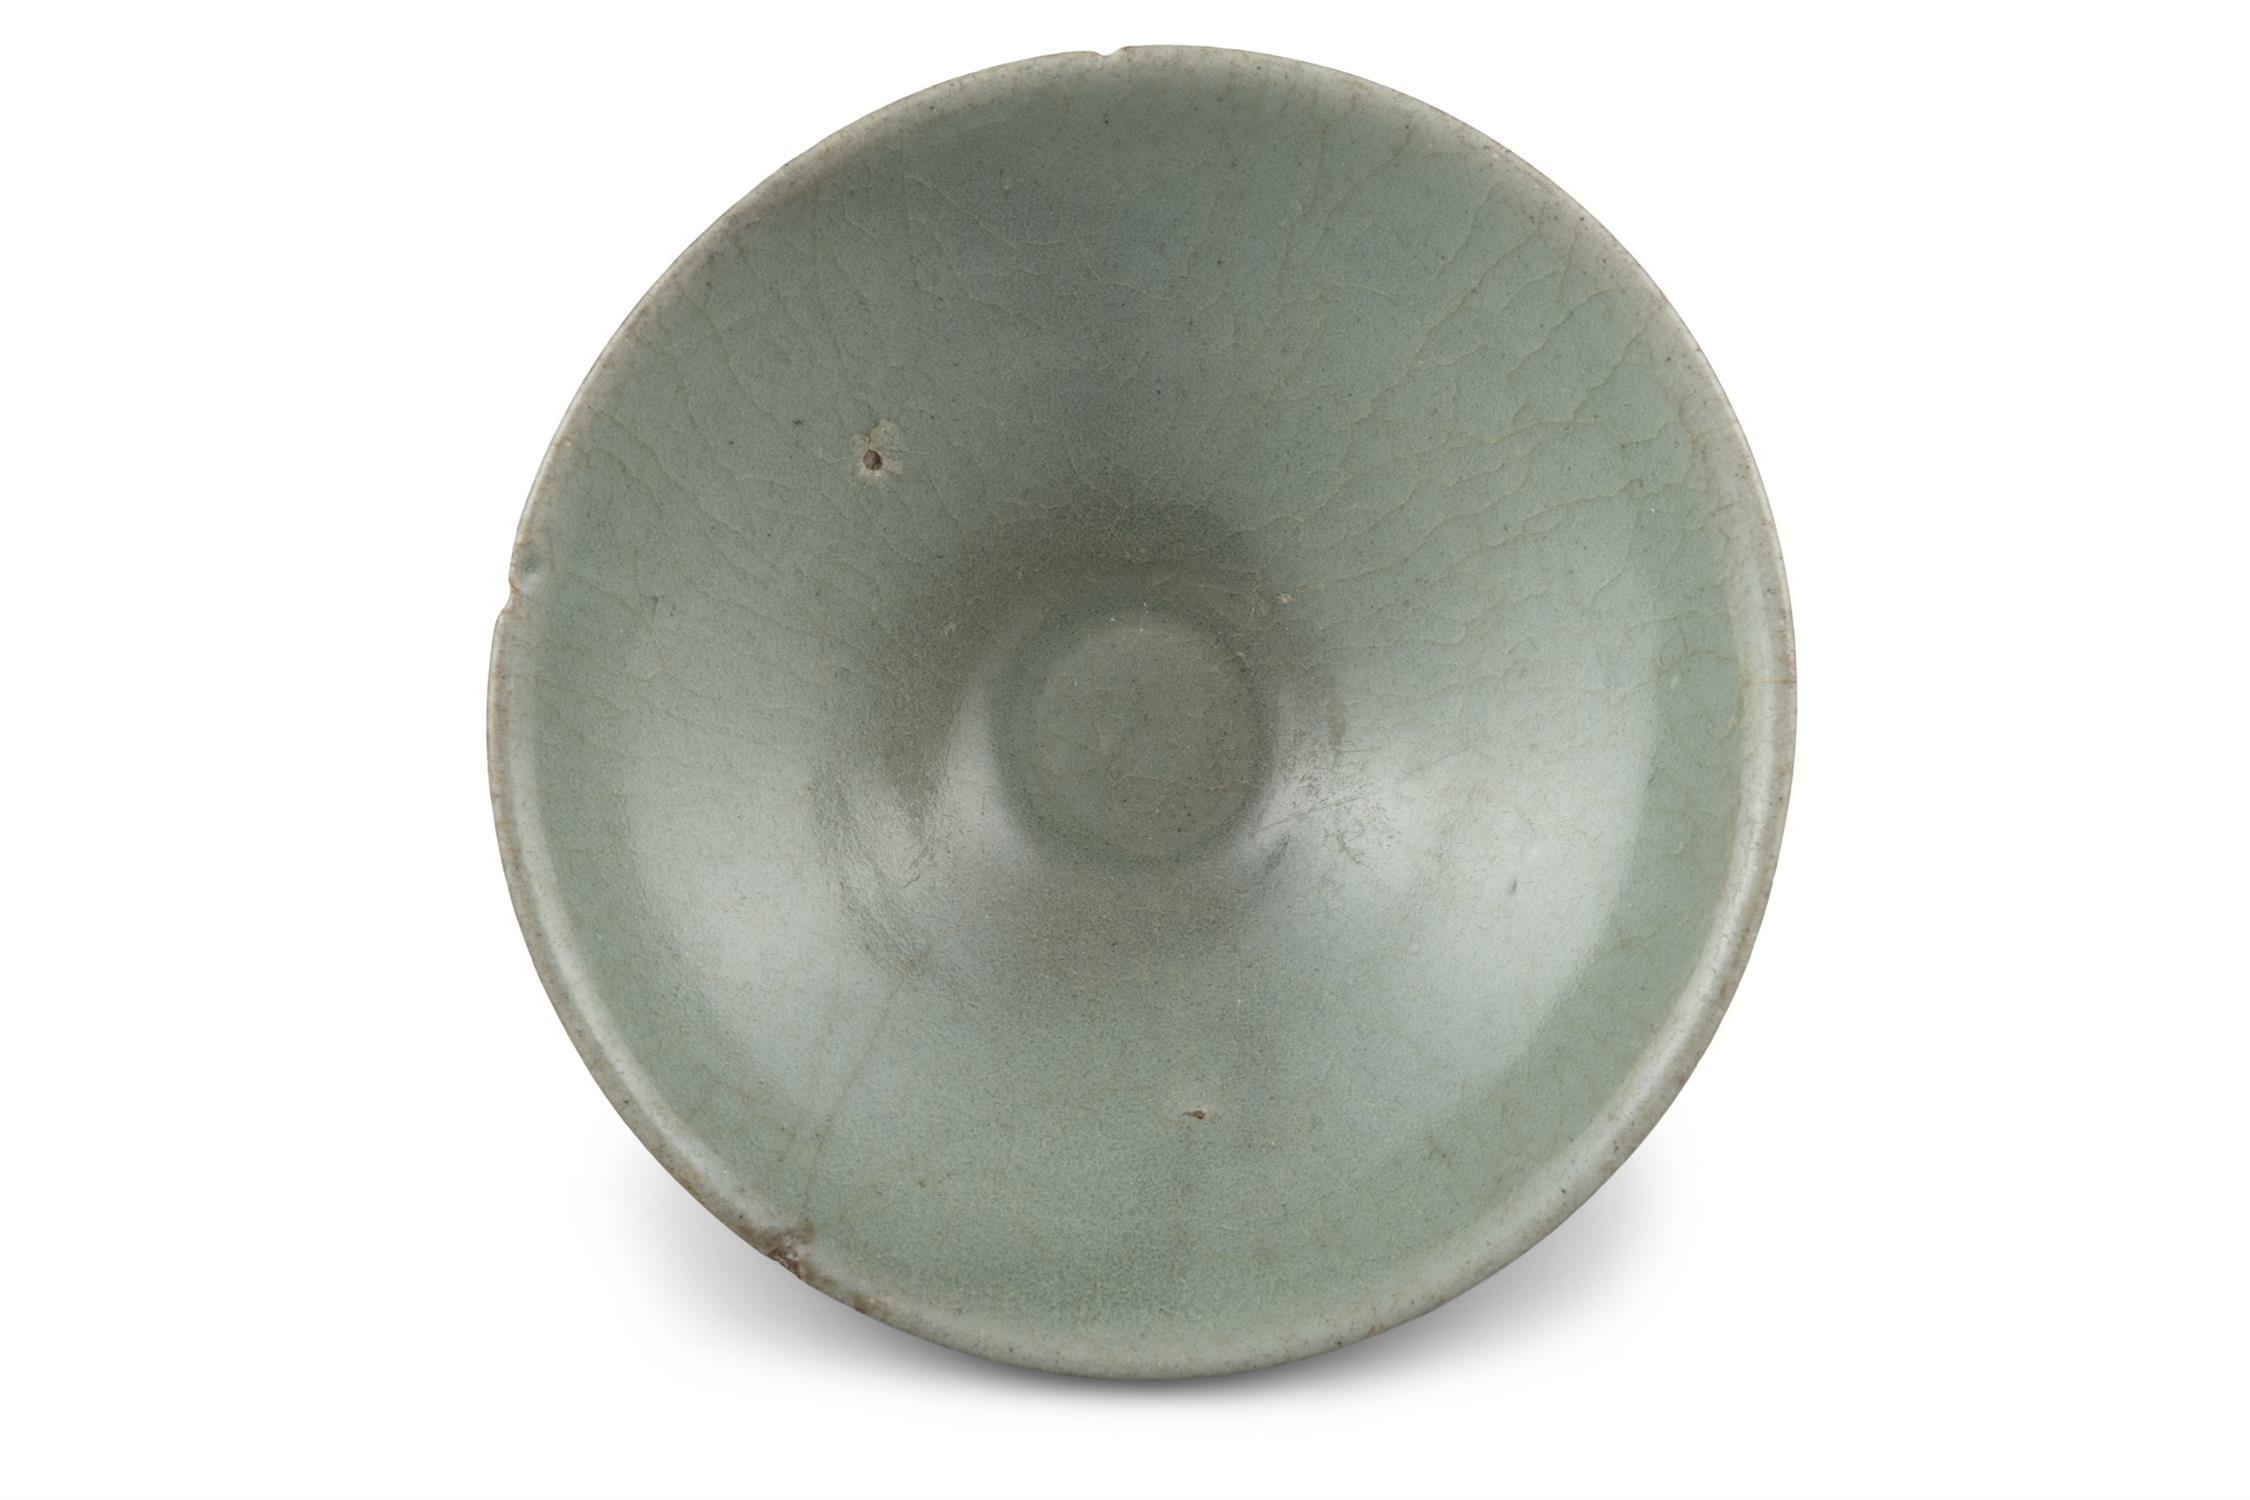 A CONICAL SHAPED CELADON GLAZED STONEWARE BOWL Korea, Joseon Dynasty H: 5cm - D: 13.3cm - Image 6 of 8